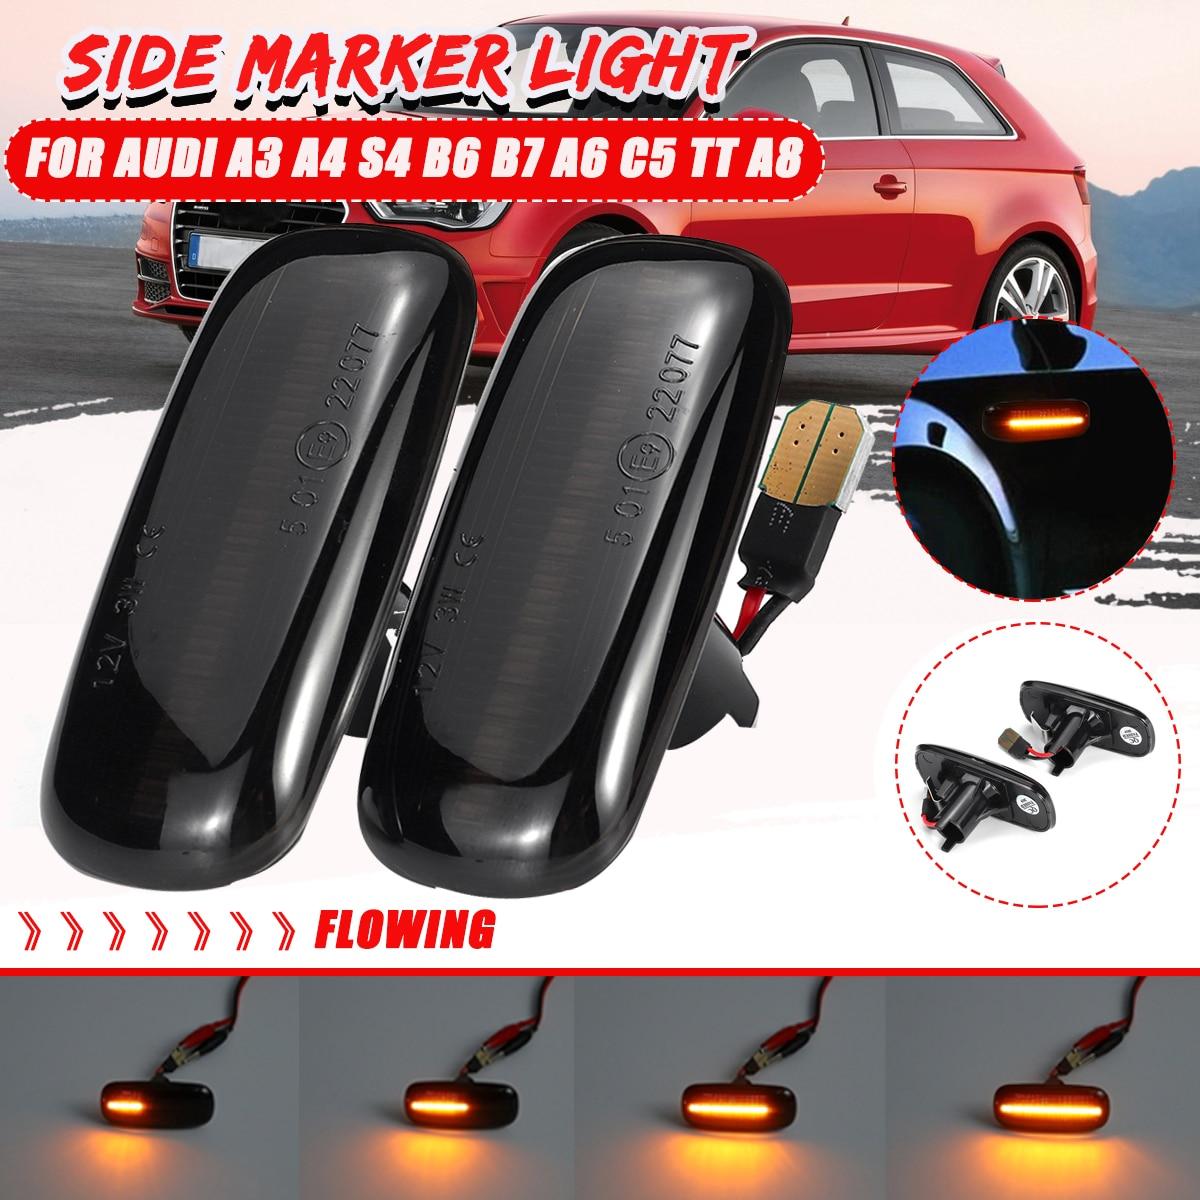 2pcs Led Dynamic Side Marker Turn Signal Light Indicator Blinker Light For Audi A3 S3 8P A4 S4 RS4 B6 B7 B8 A6 S6 RS6 C5 C7